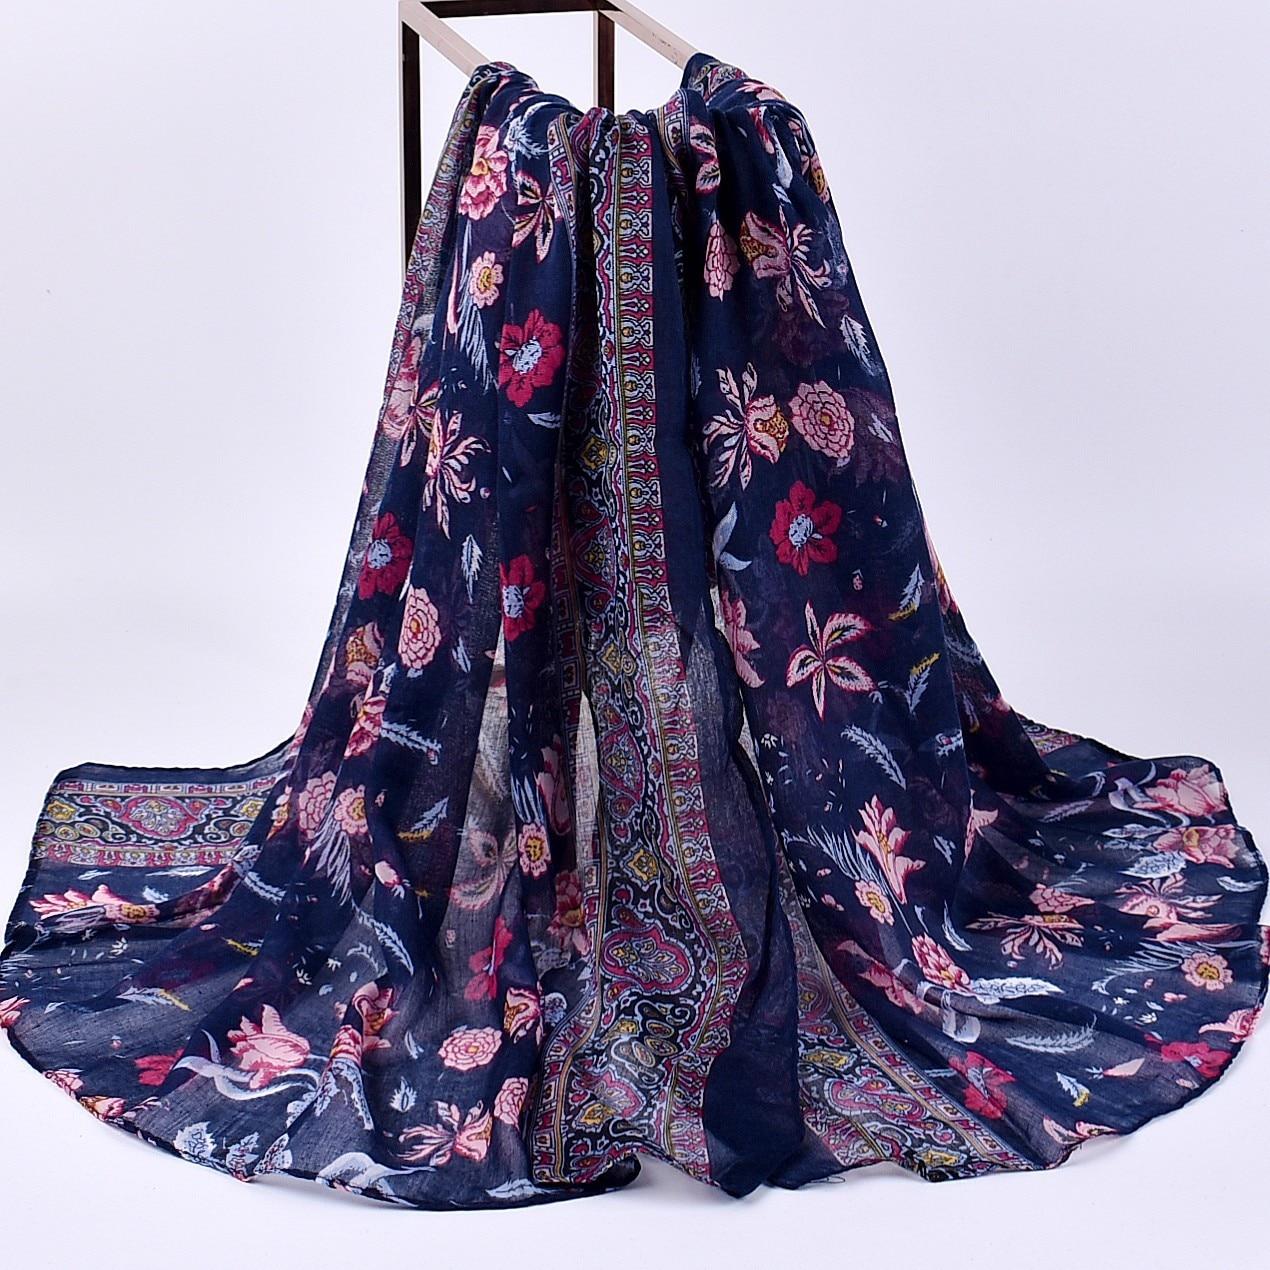 2019 New Design Fashion Scarves Flower Pattern Bohemia Sunscreen Women Chiffon Scarves Autumn Winter Long Scarf Beach Shawl